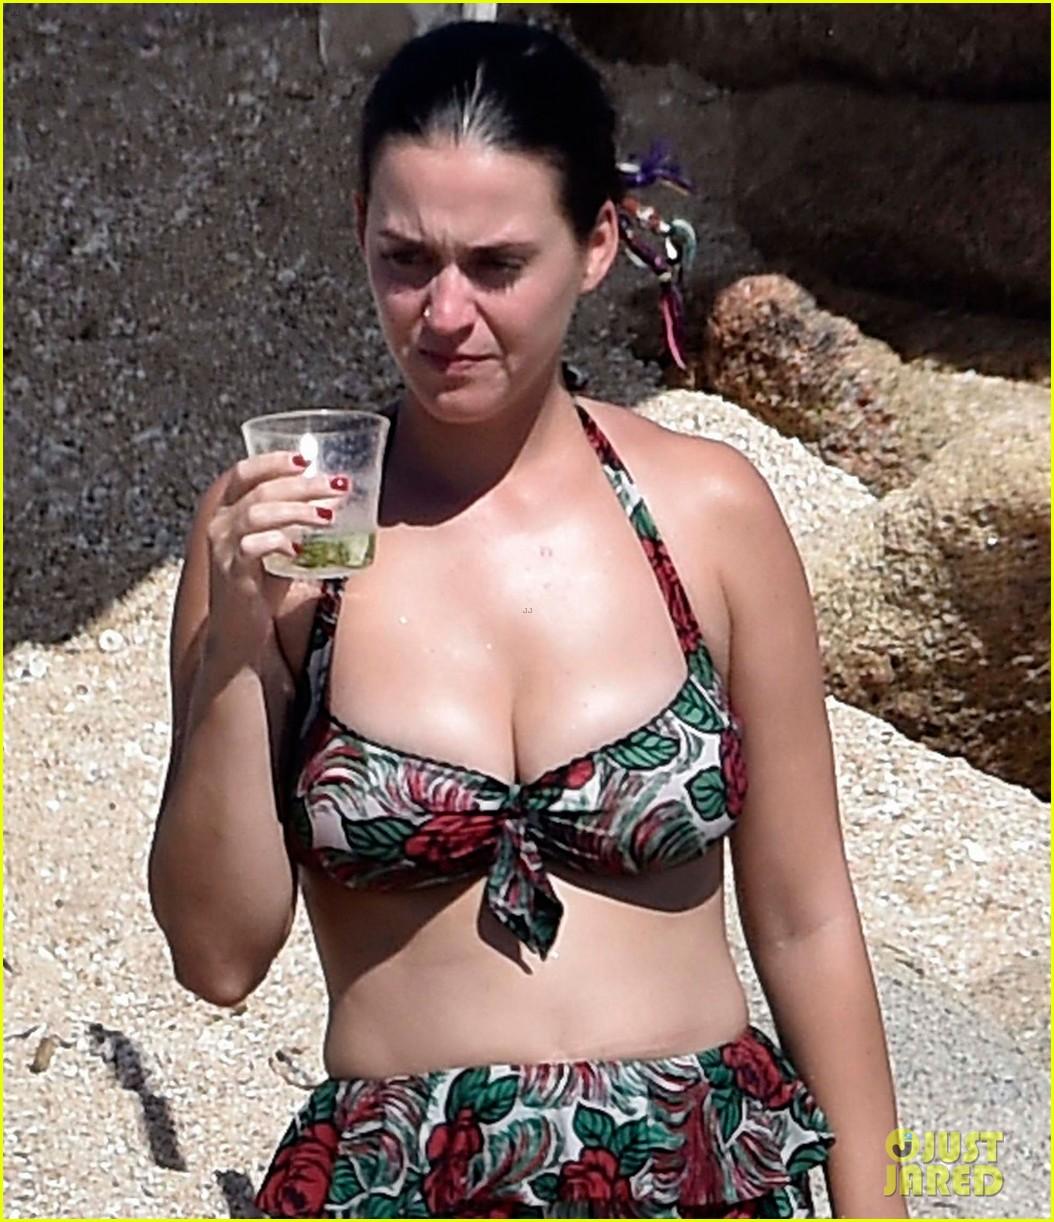 Sexy Bikini Katy Perry and Orlando Bloom naked photo 2017